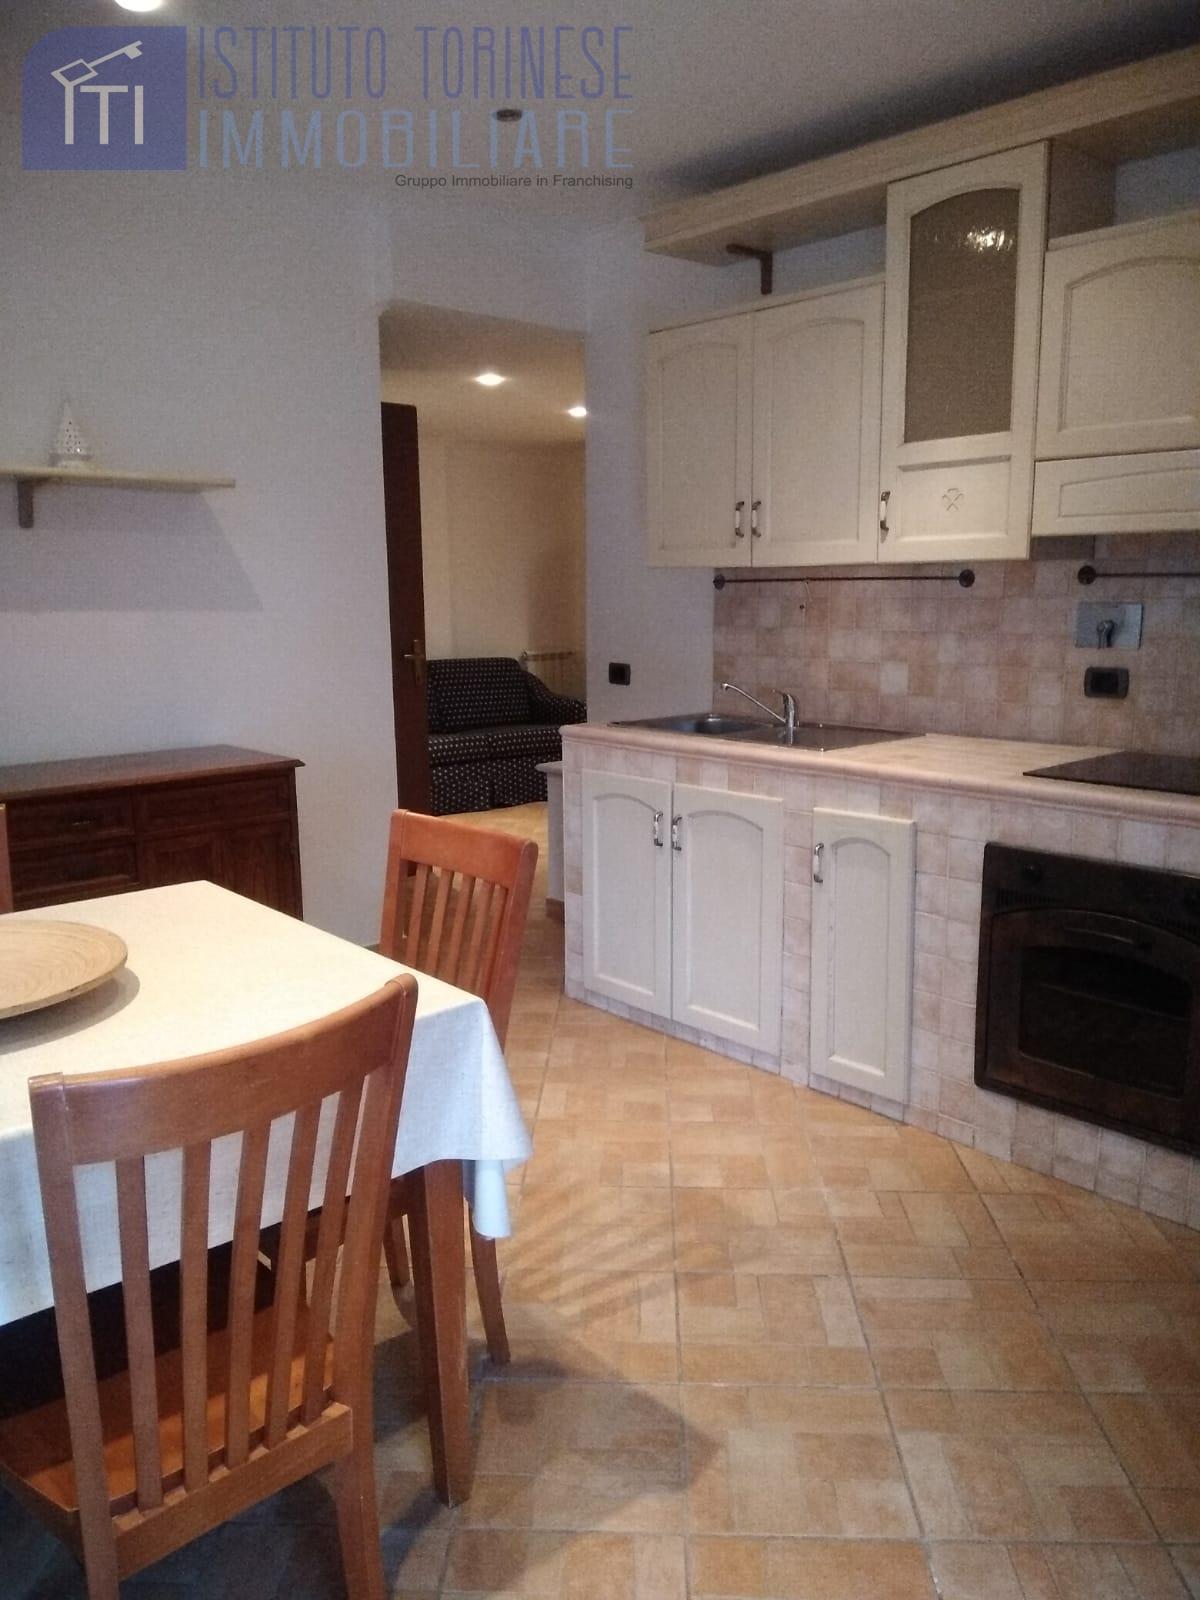 roma affitto quart: axa/casalpalocco/vitinia istituto-torinese-immobiliare